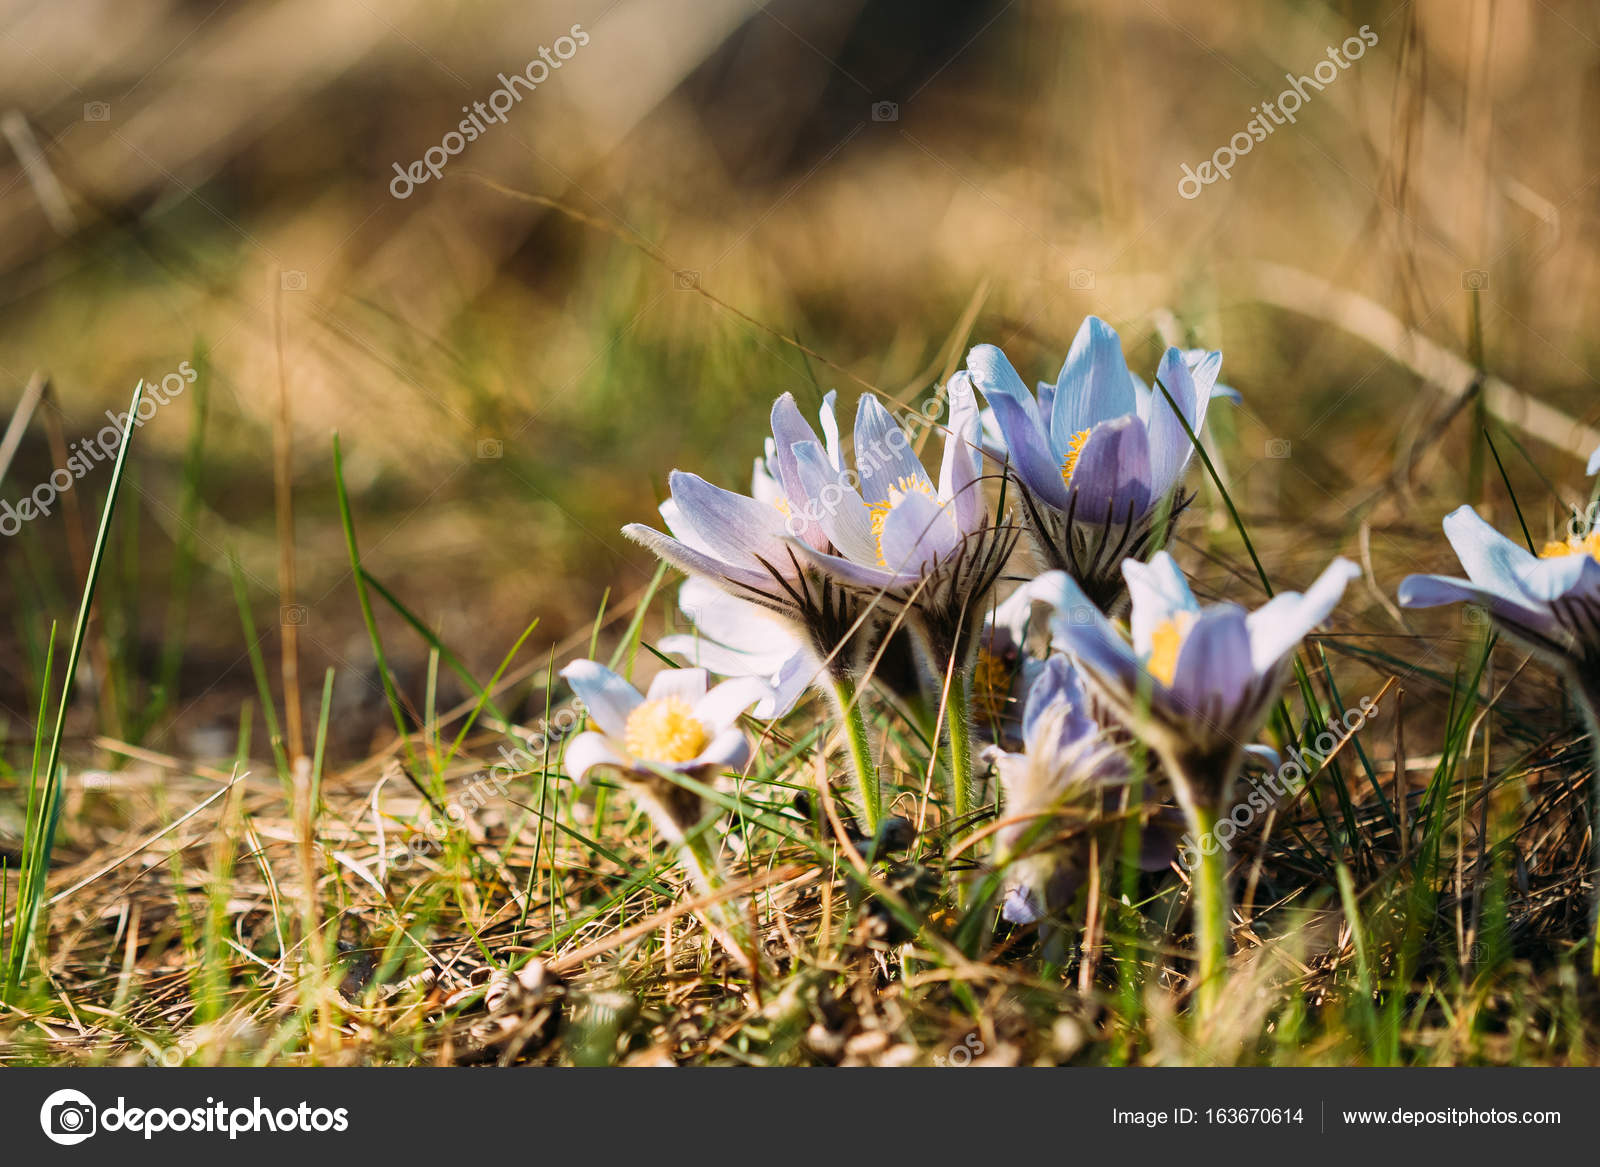 Wild Spring Flowers Pulsatilla Patens Flowering Blooming Plant